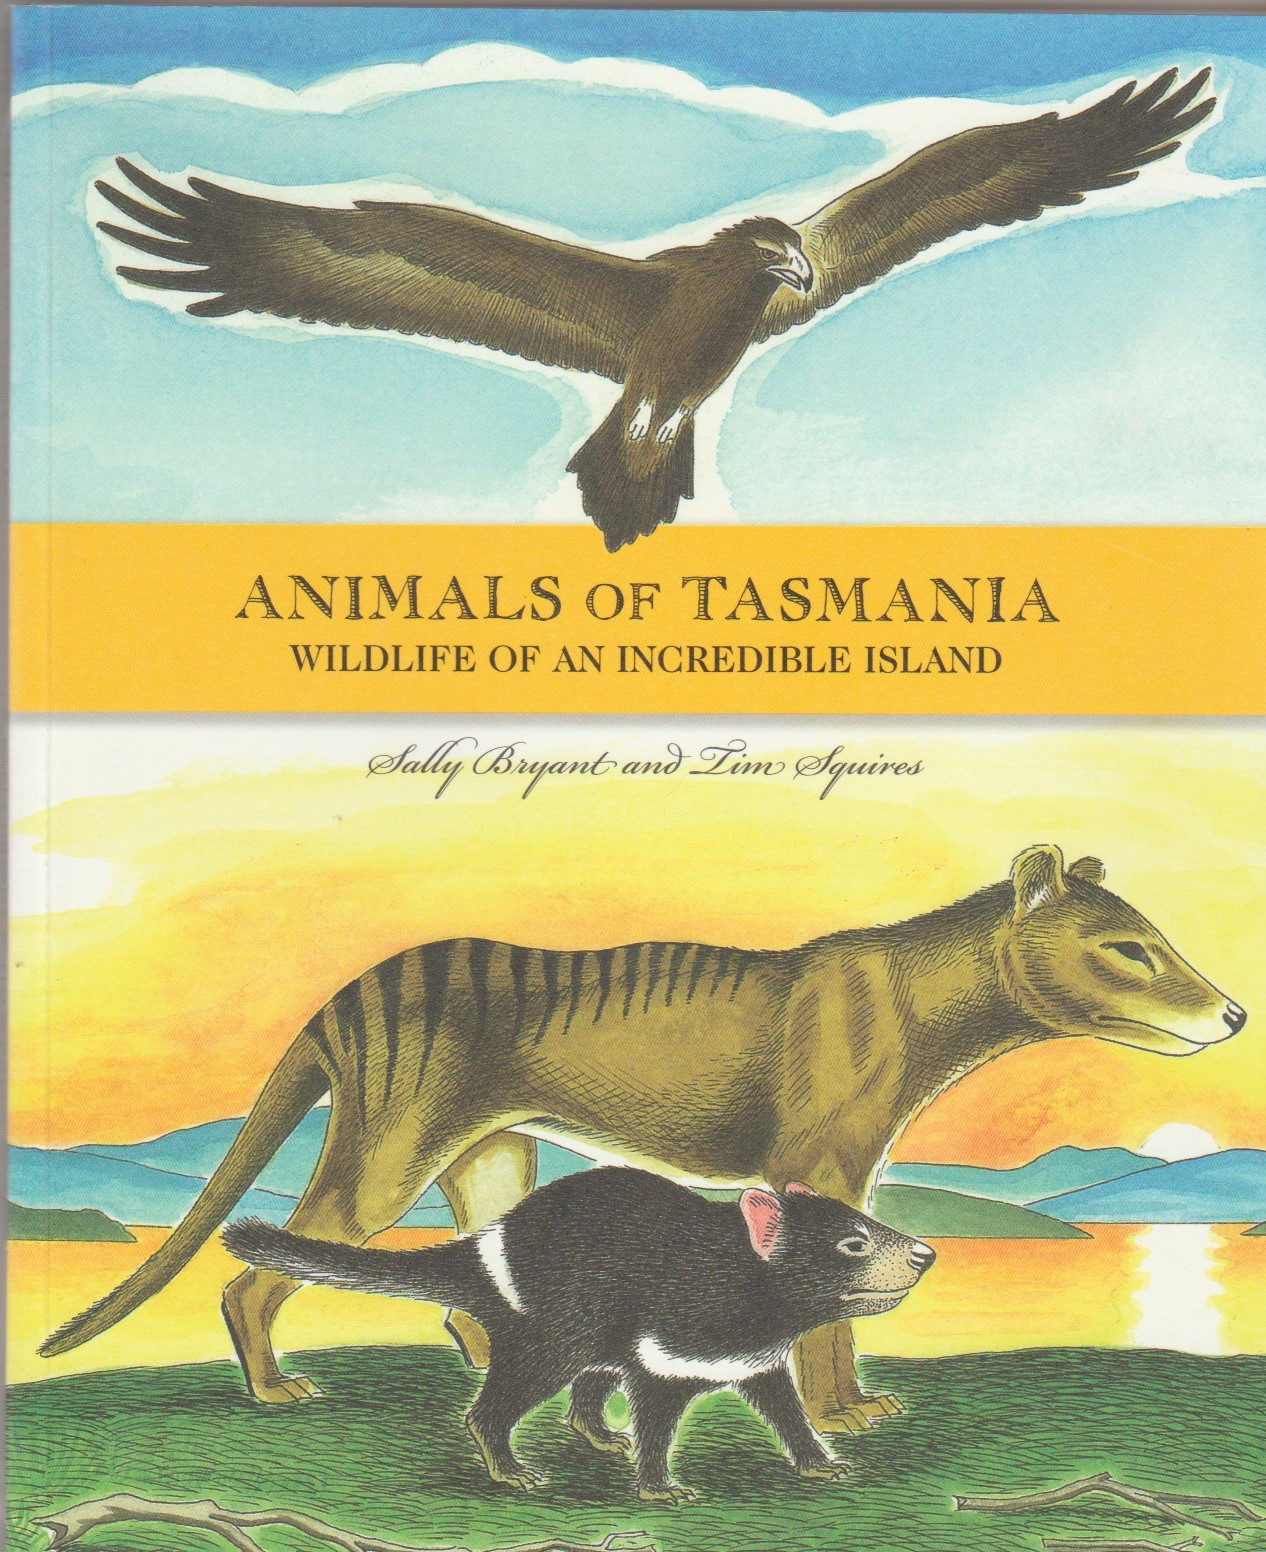 Animals of Tasmania - Wildlife of an Incredible Island